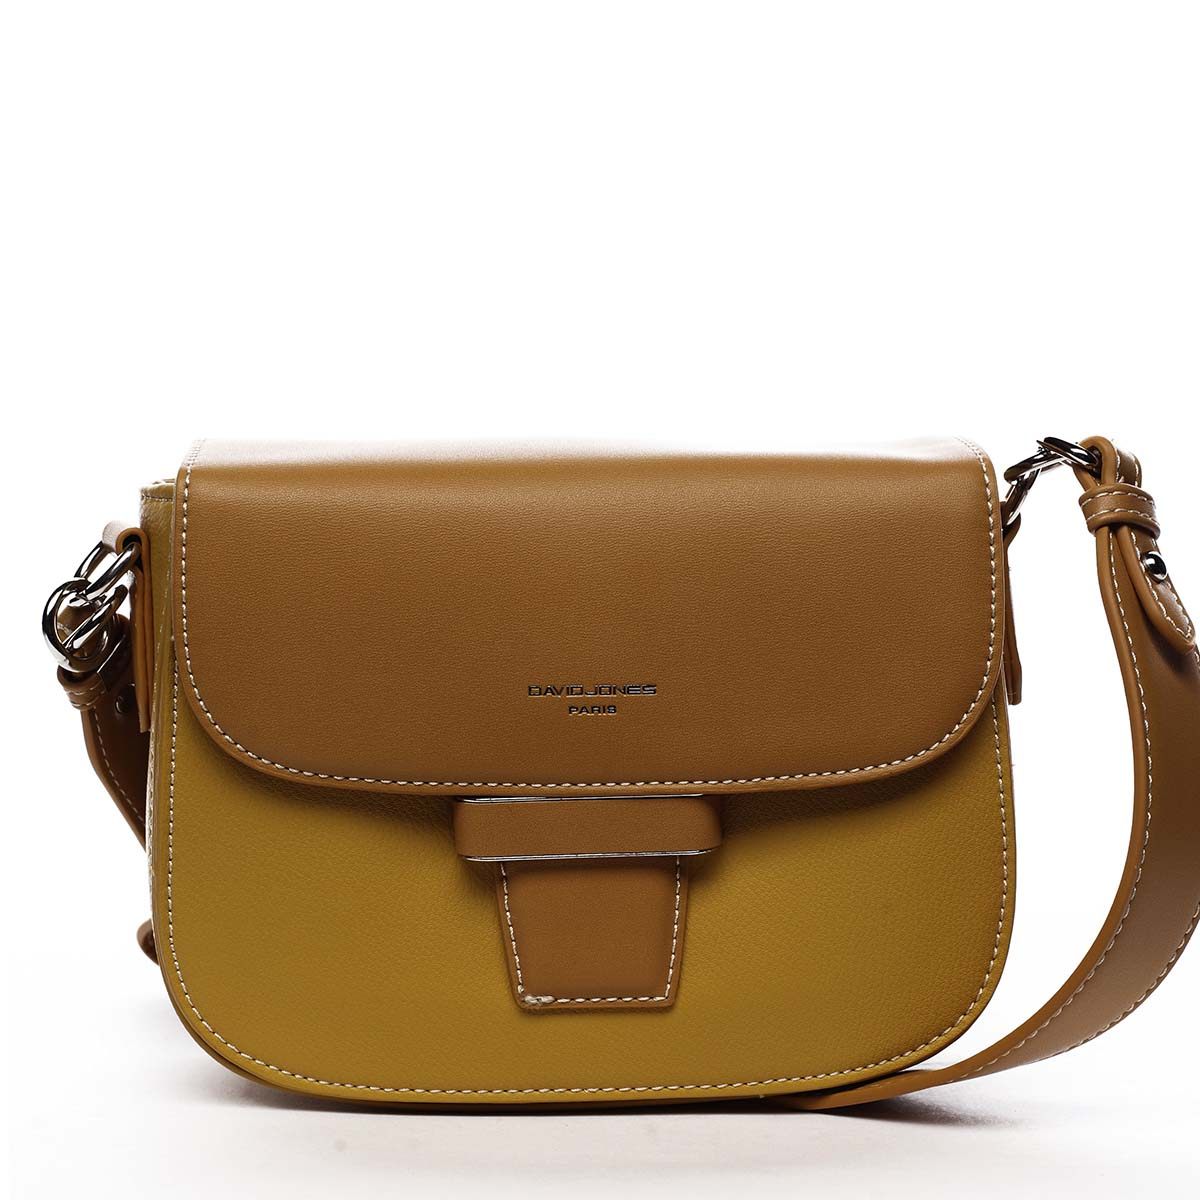 Dámská kabelka žlutá - David Jones Nancy žlutá